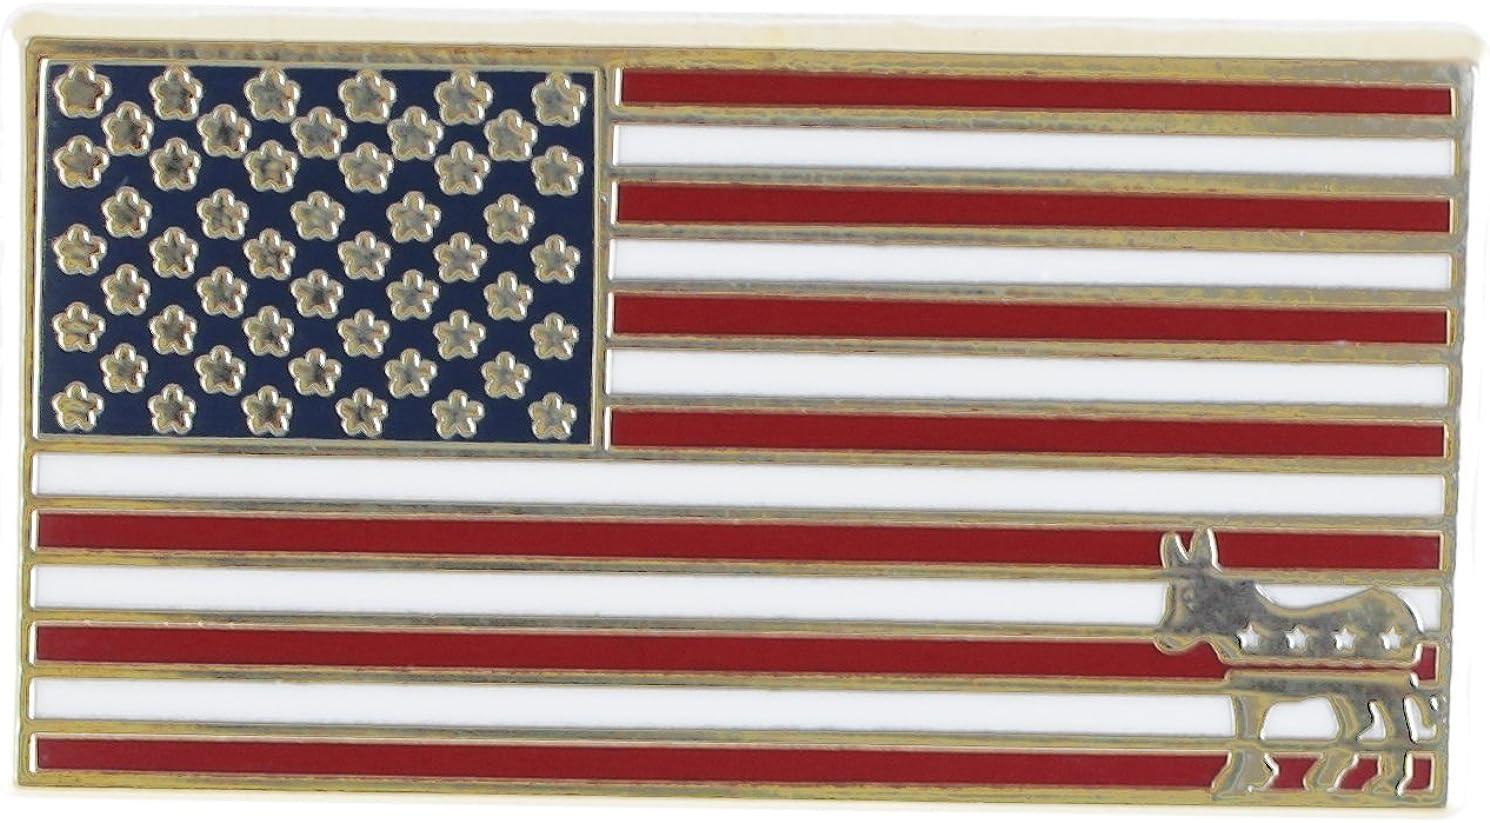 Forge American Flag Democrat Donkey Lapel Pin (1 Pin)